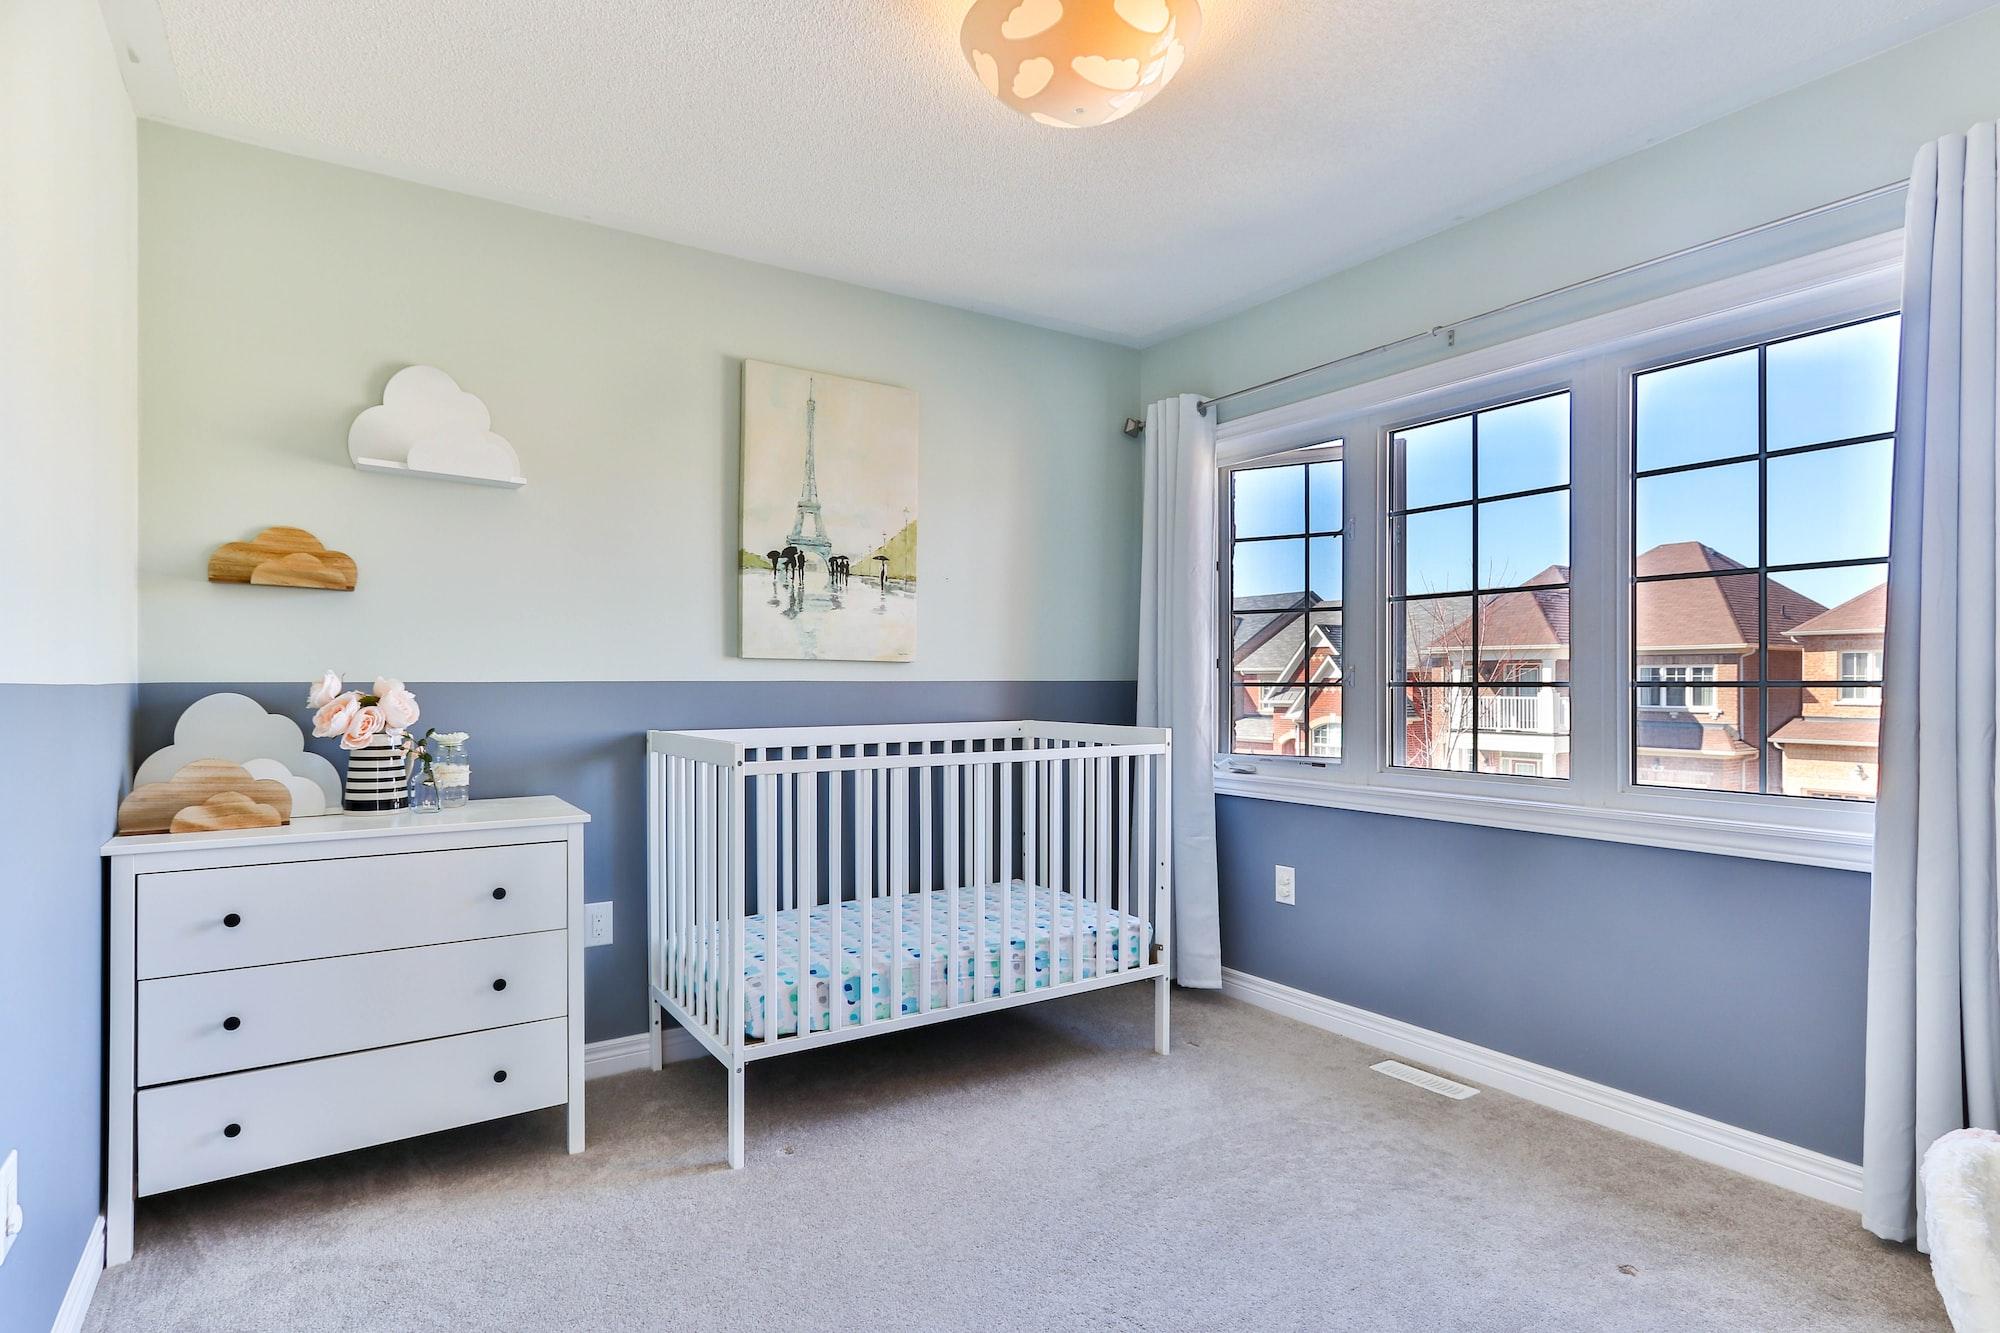 10 essentials for your baby's bedroom